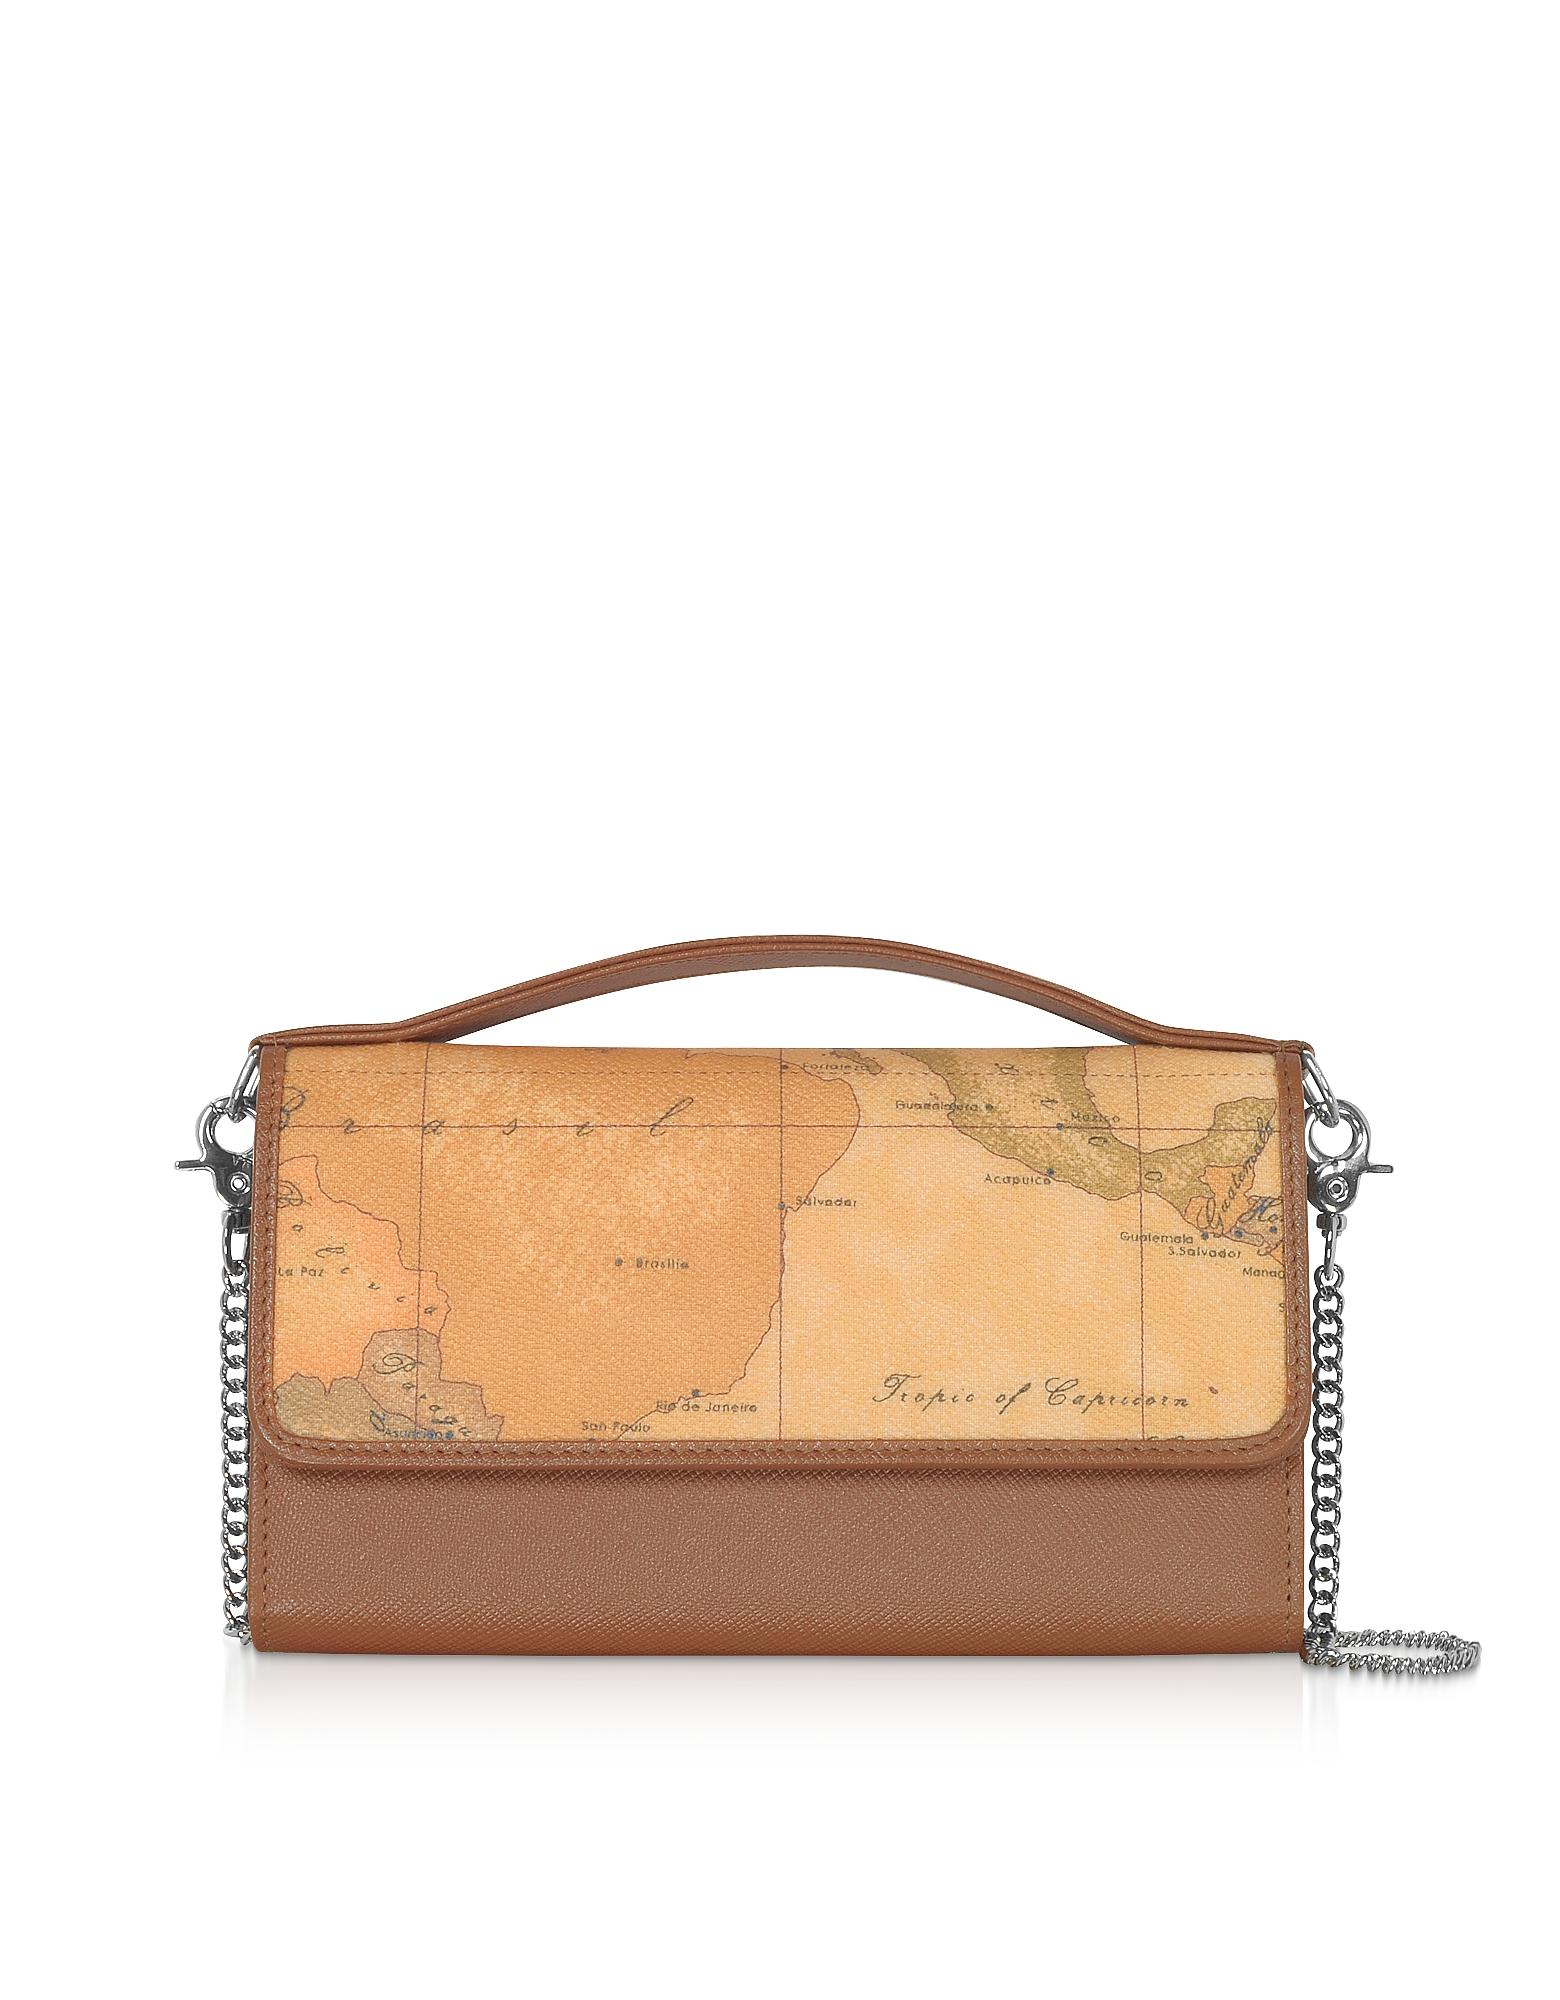 Alviero Martini 1A Classe Designer Handbags, Phone Holder Wallet Purse w/Chain Strap